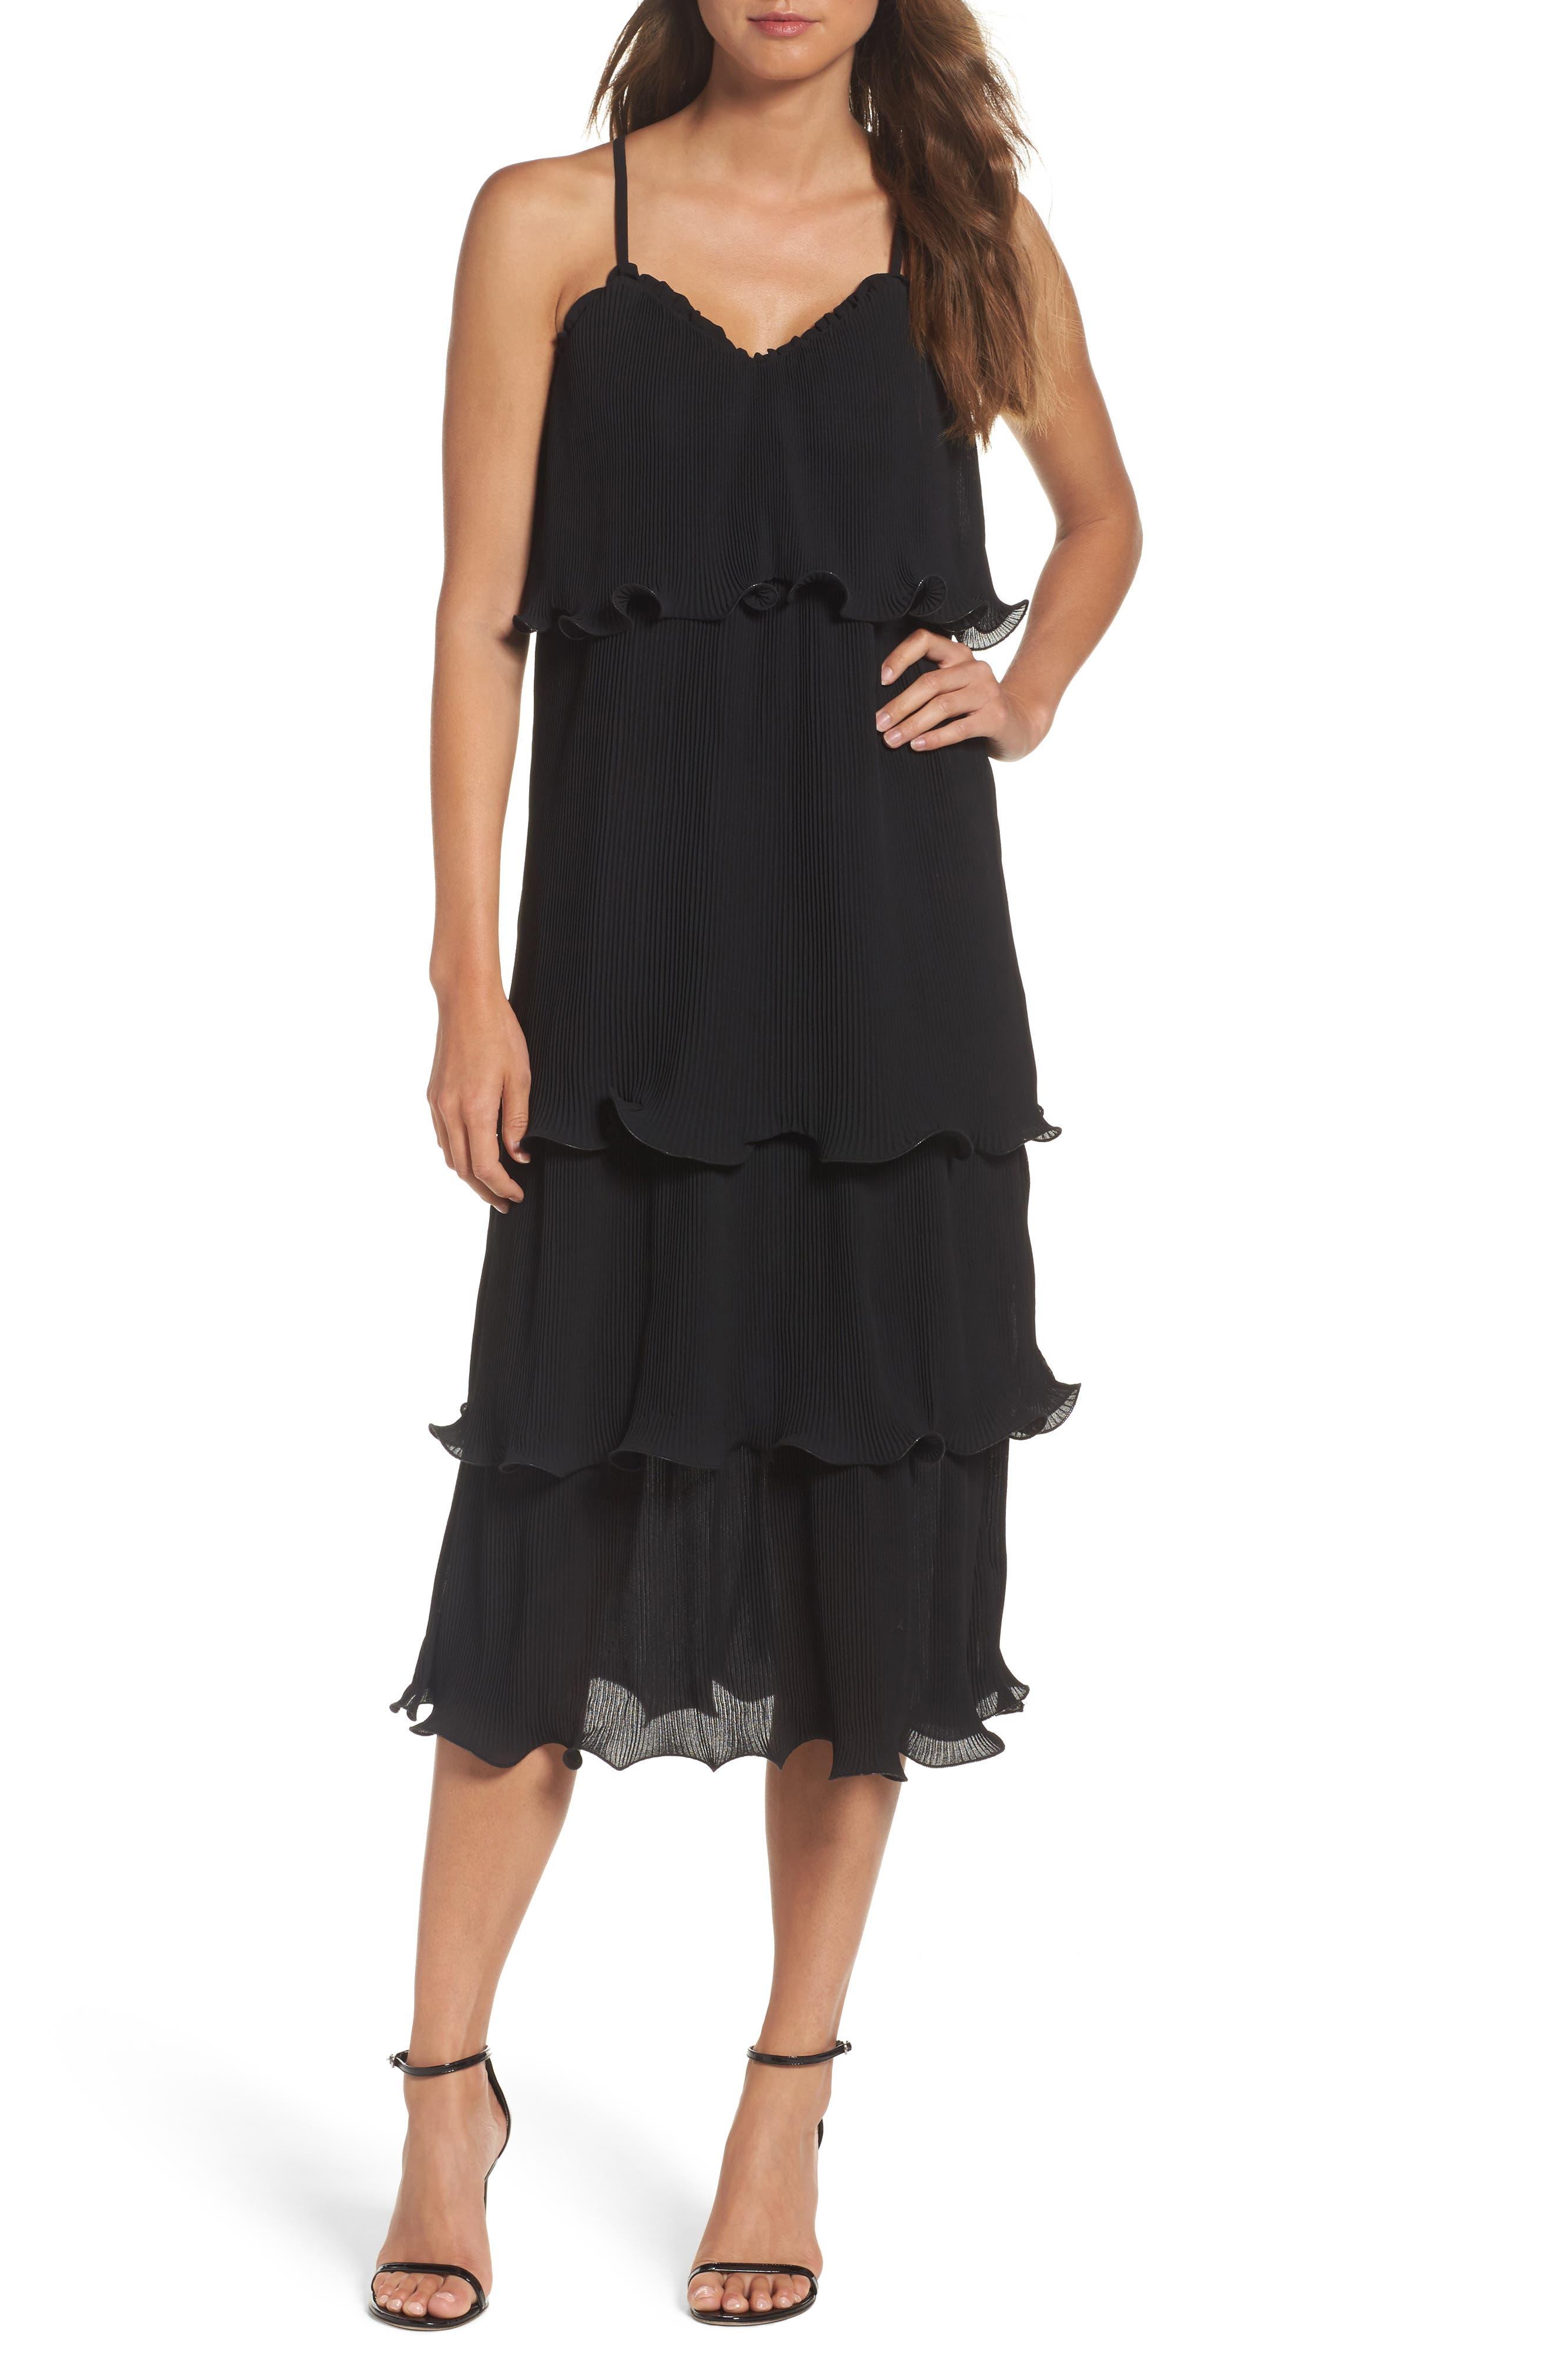 TRUE DECADENCE BY GLAMOROUS Tiered Midi Dress